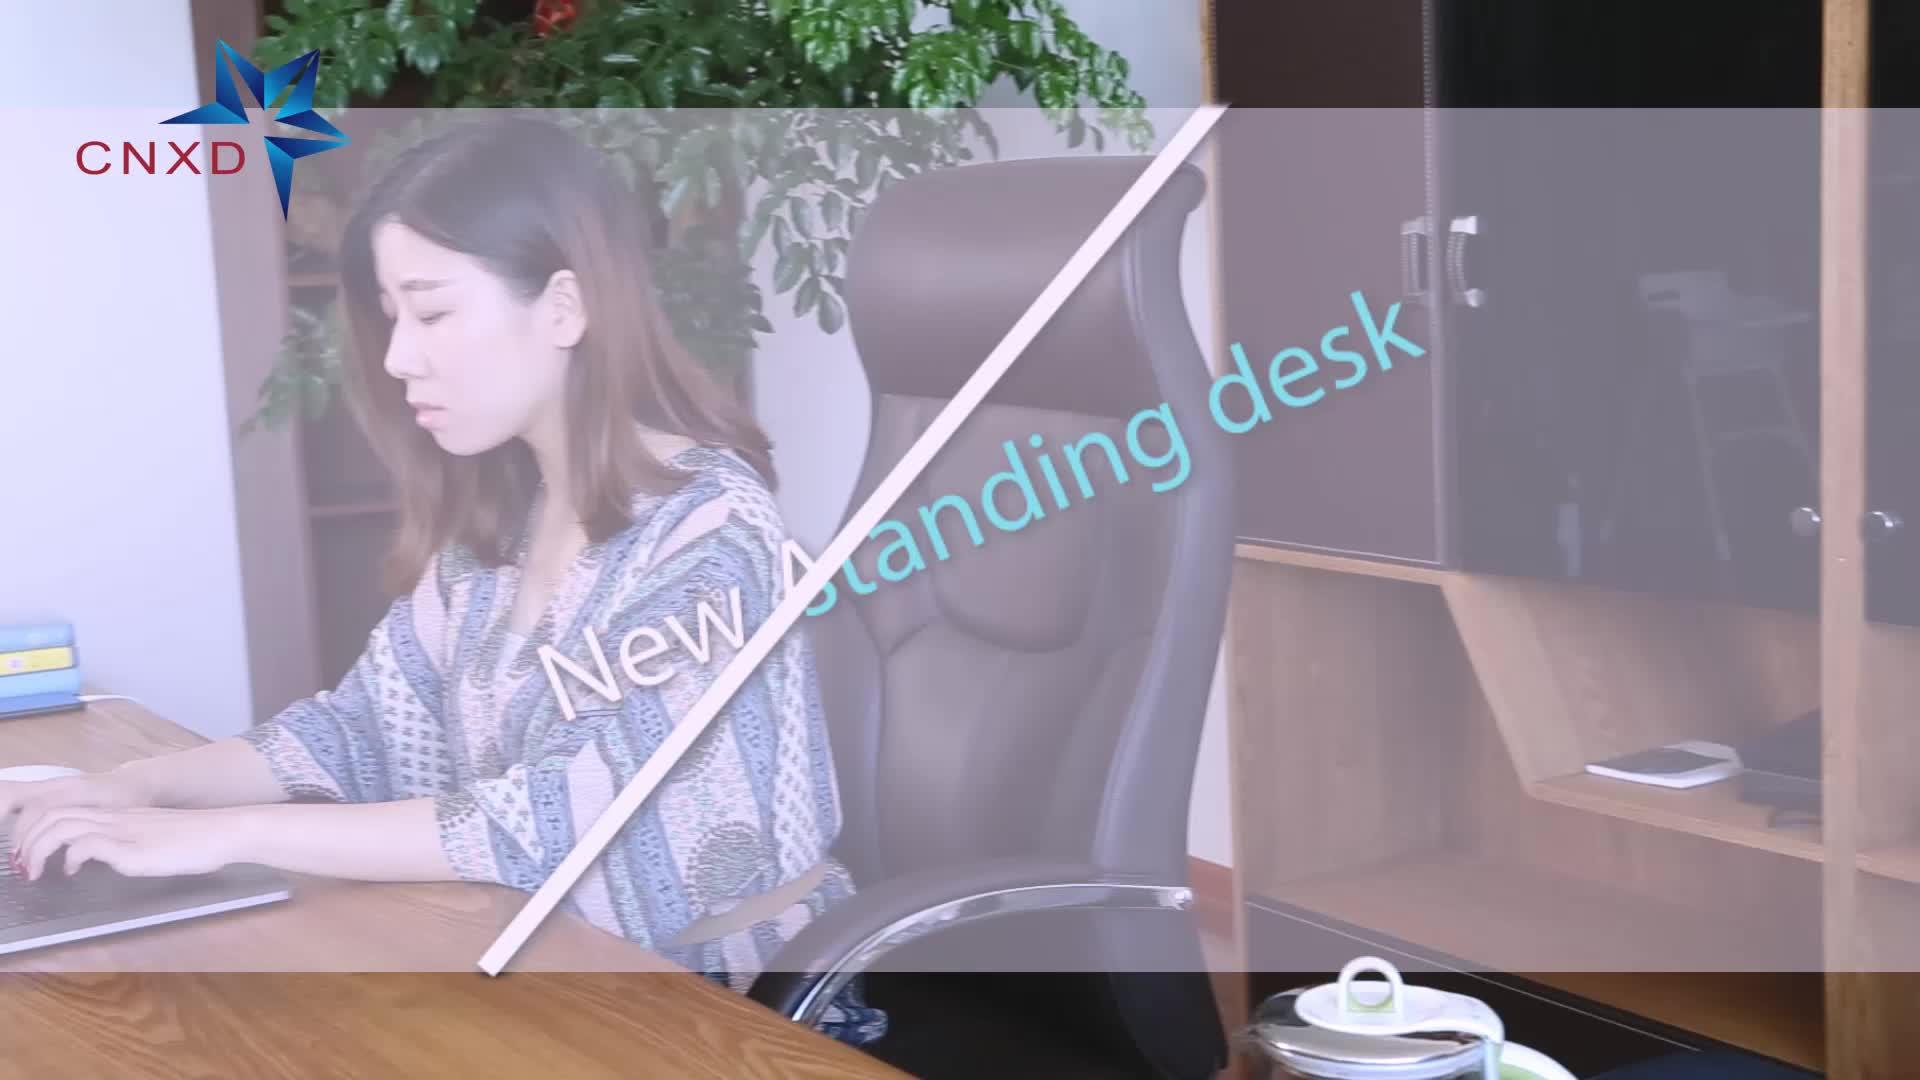 Ergonomic portable computer desk folding table/stand desk riser